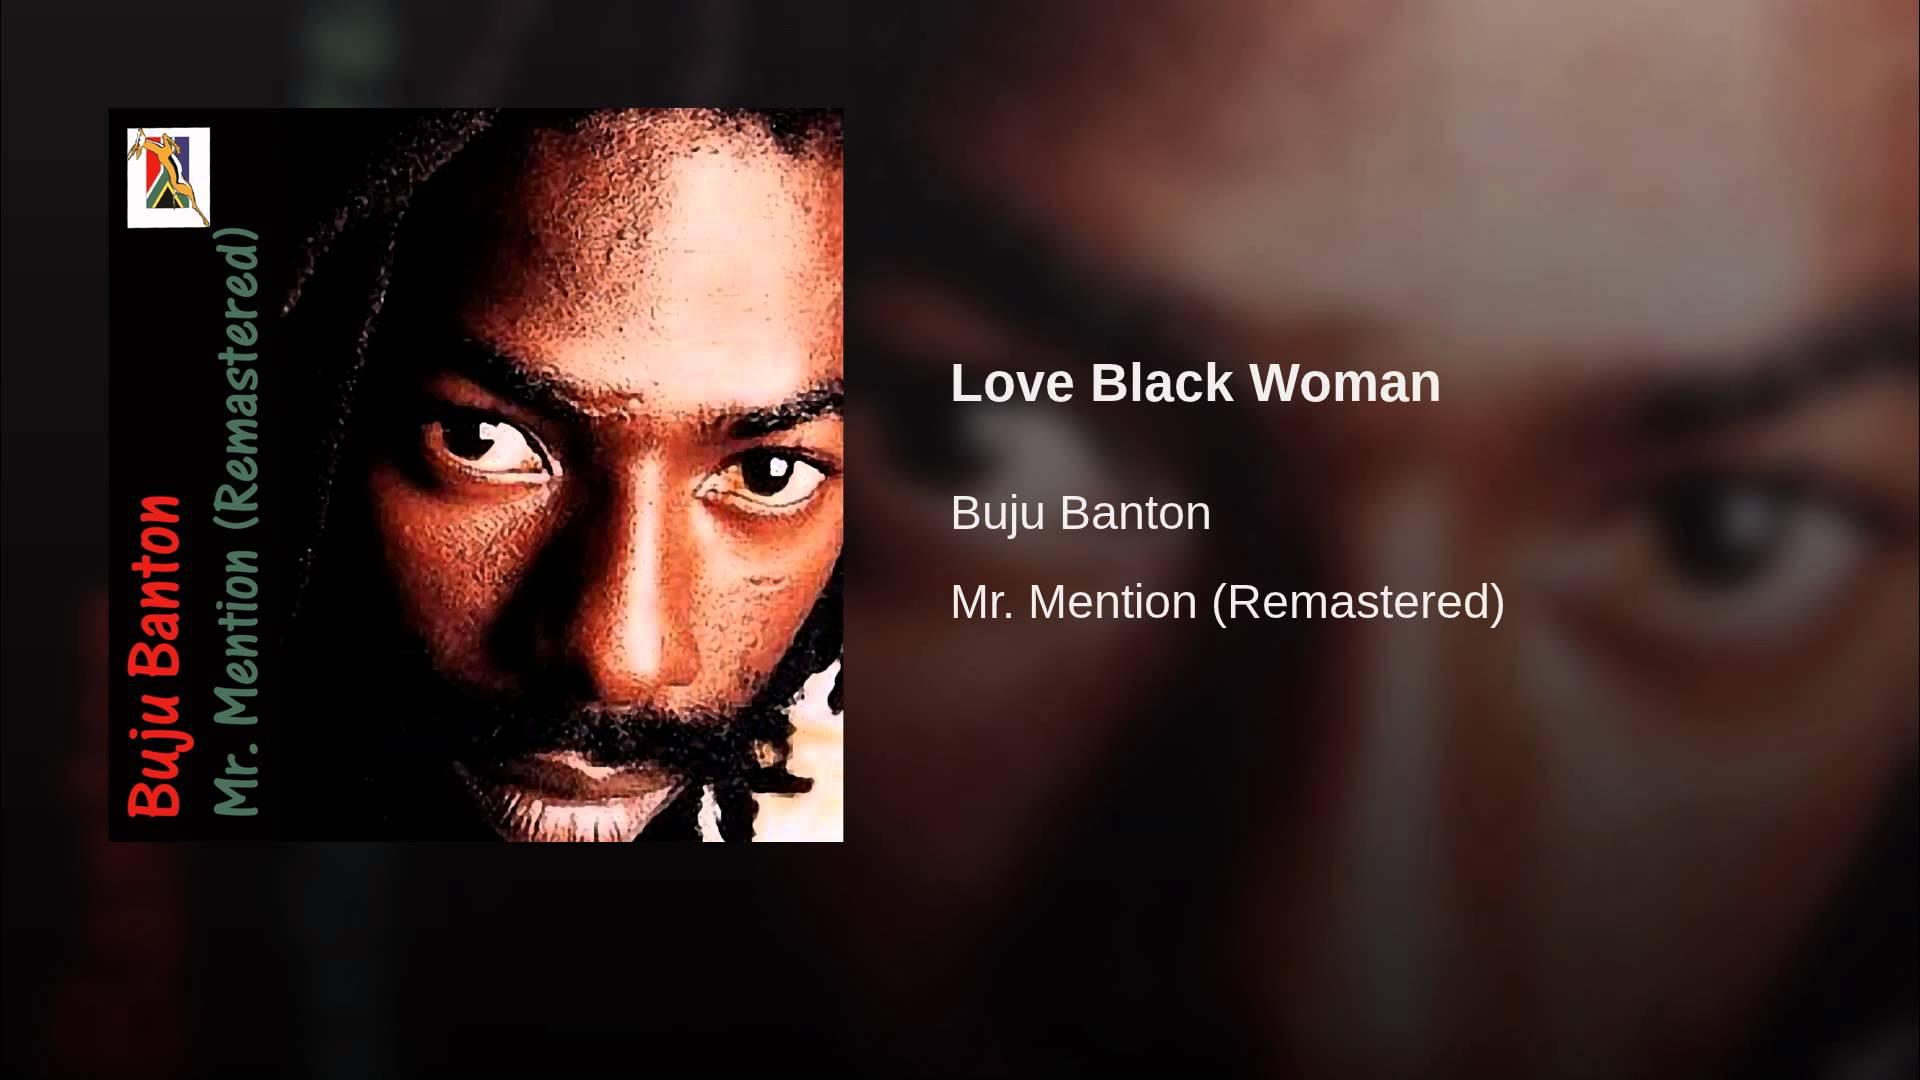 Love Black Woman